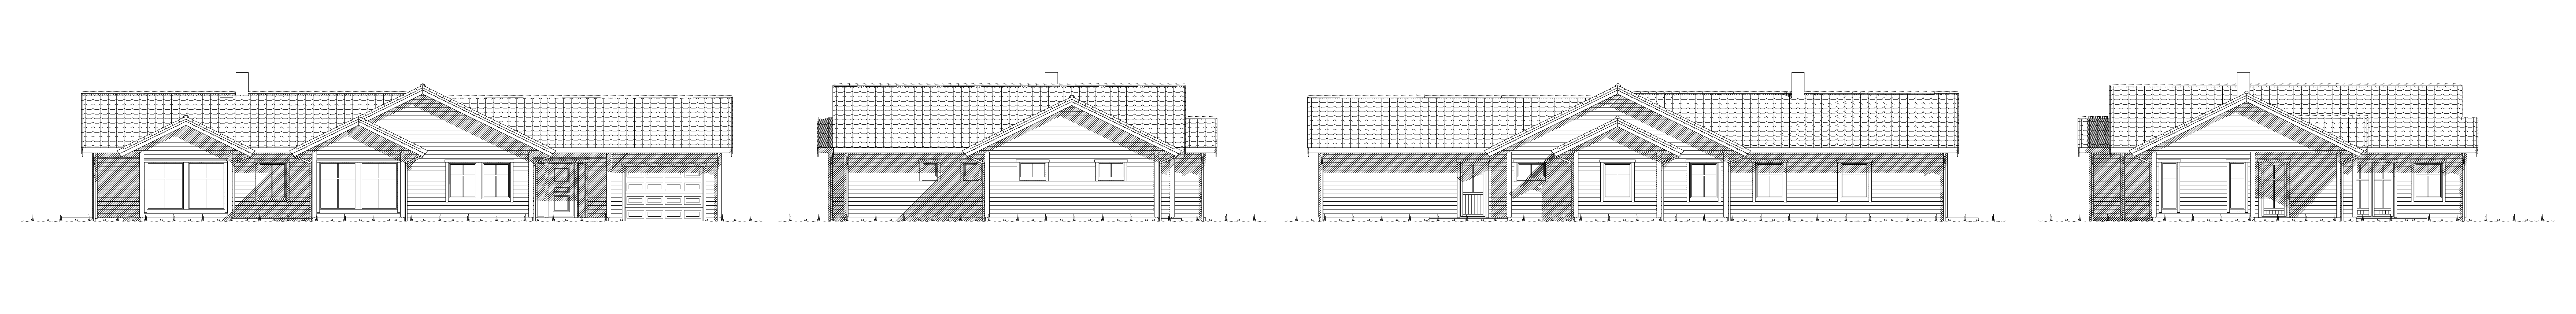 Koppefjellet fasade